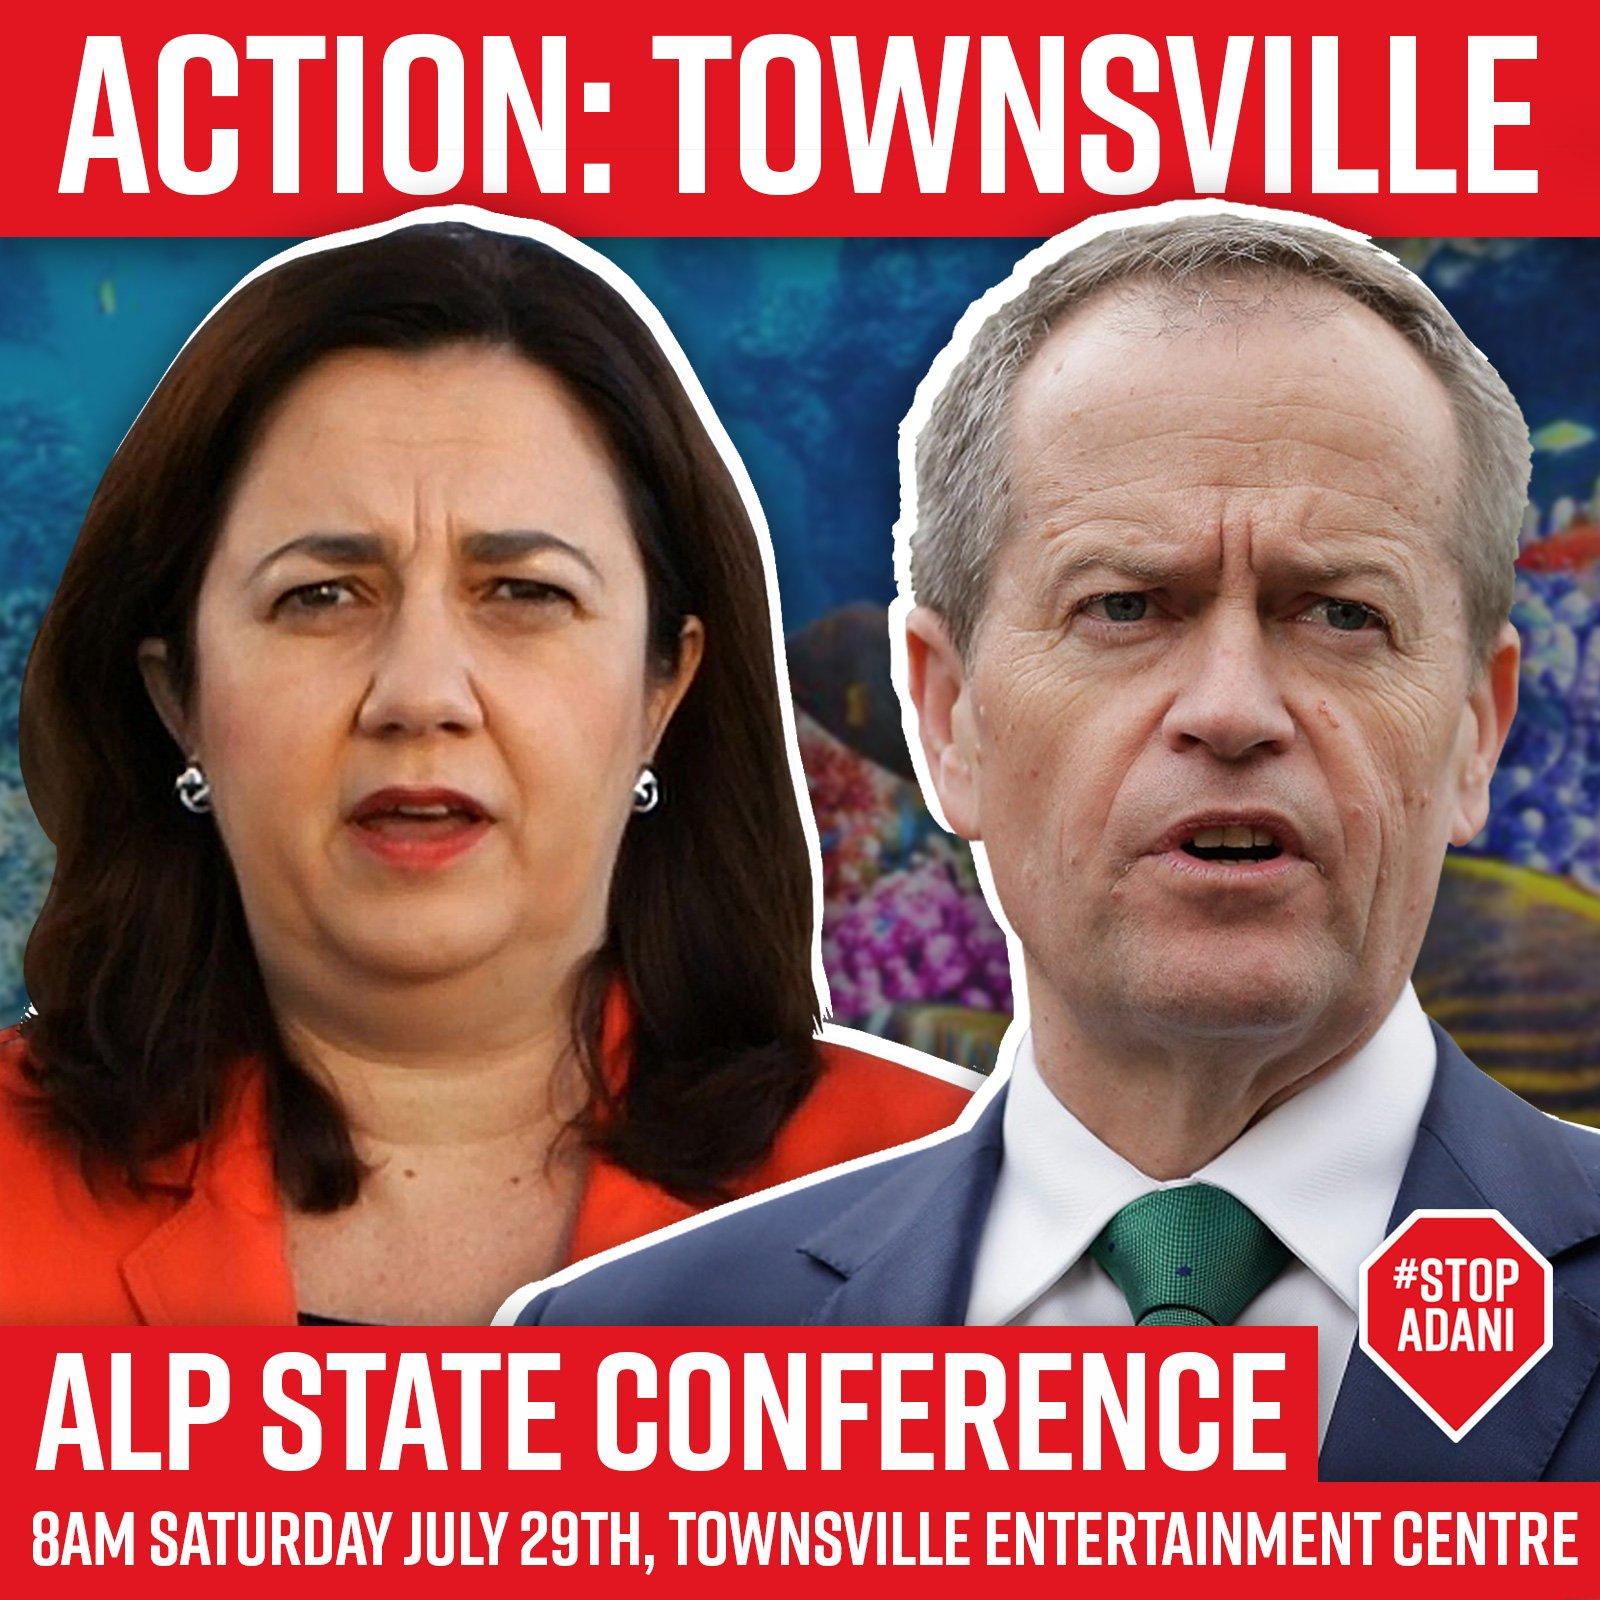 Big #Townsville #StopAdani Action at #ALP State Conference this Saturday. No #NAIF funding. #Qldpol @AnnastaciaMP @billshortenmp https://t.co/A8IXnp8u7l